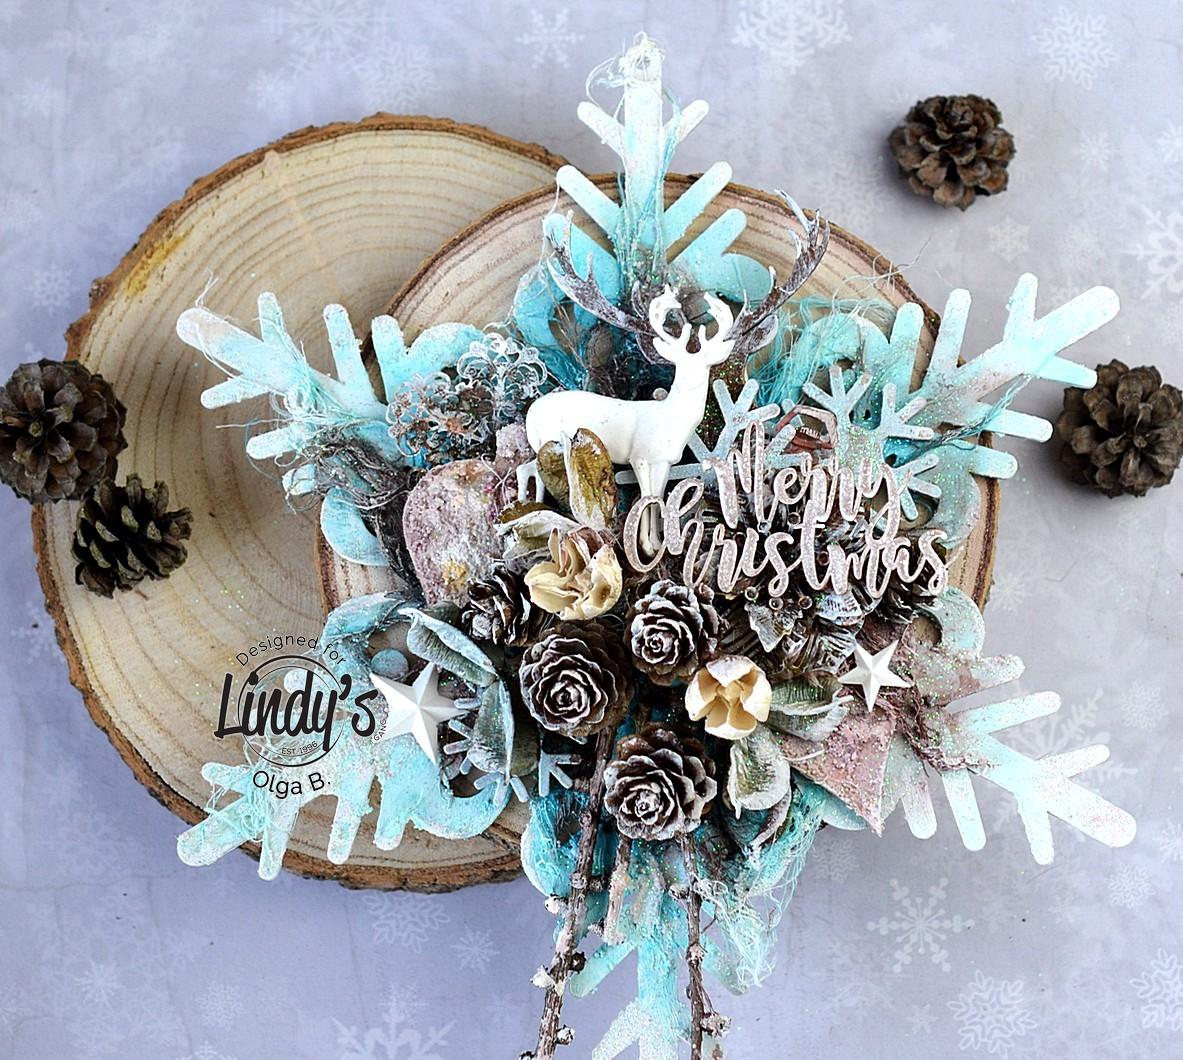 Altered Wooden Snowflake with Olga Bielska - Lindy's Gang